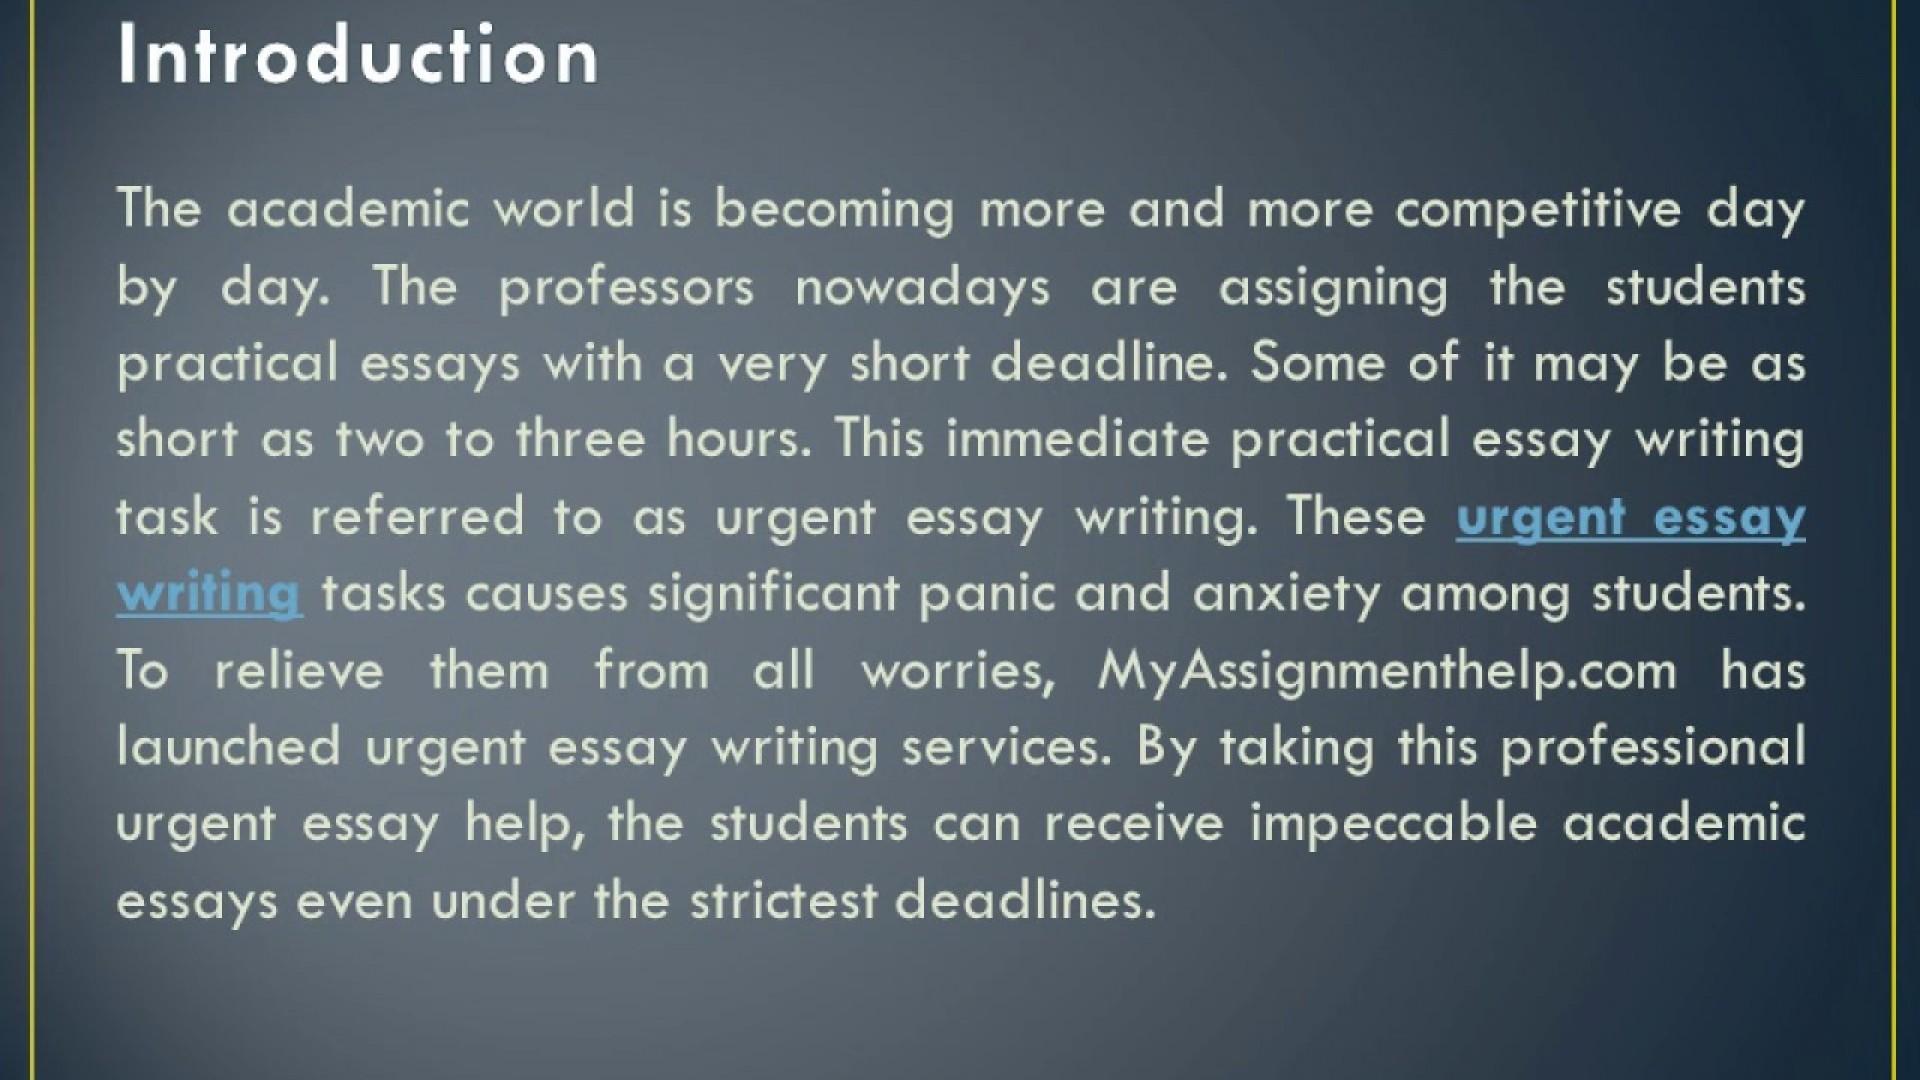 025 Urgent Essay Maxresdefault Impressive Uk Help 1920